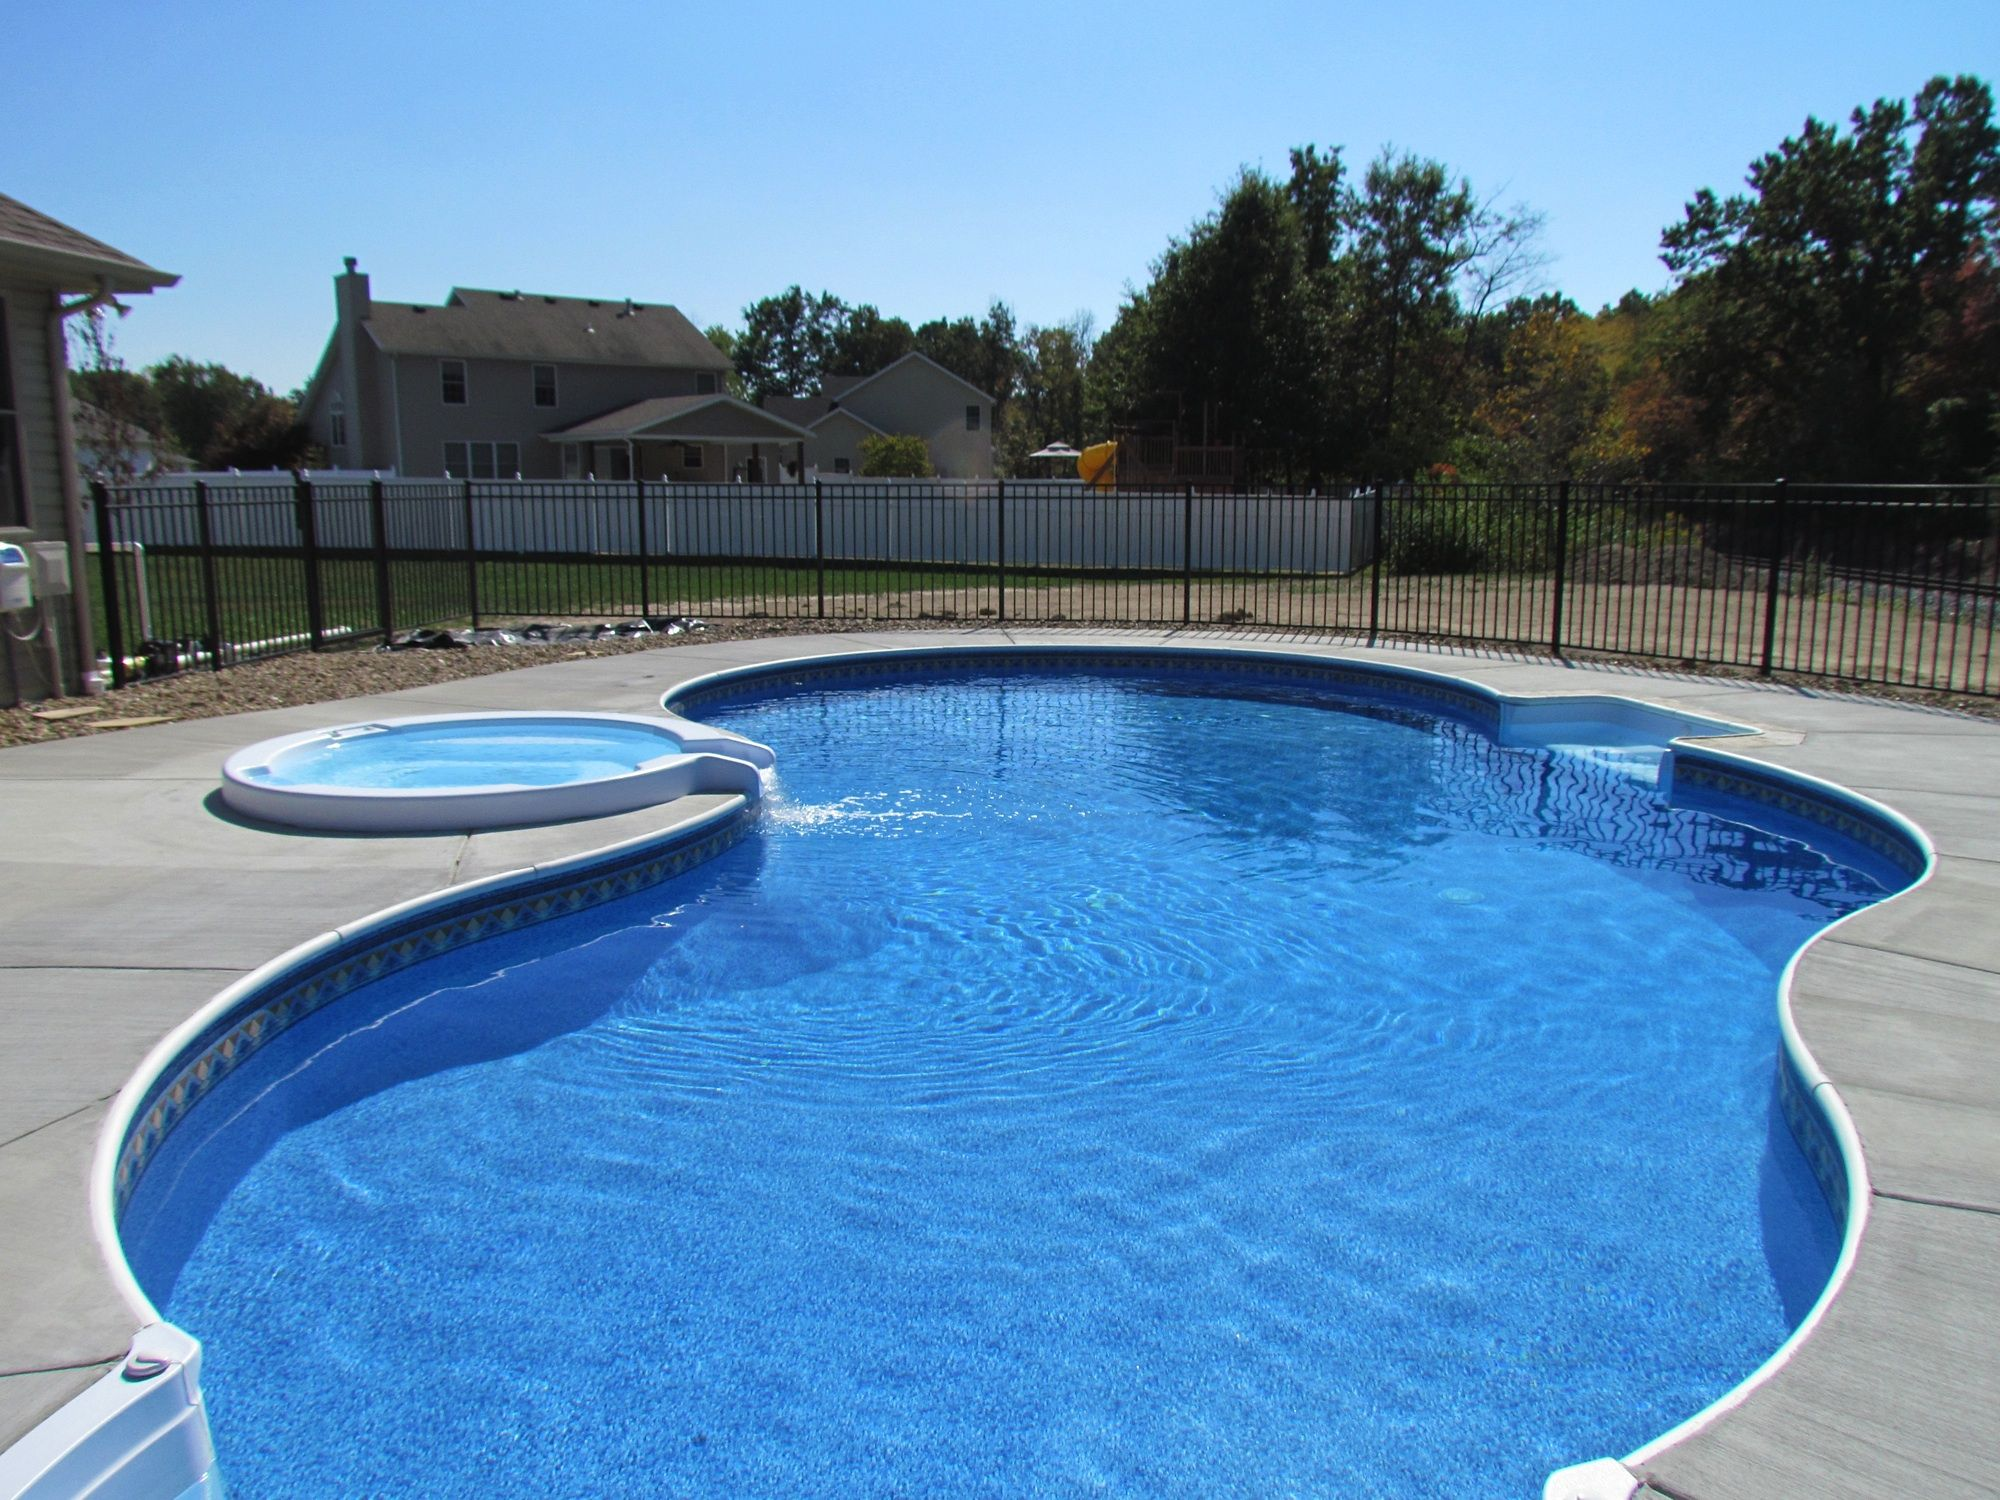 18 x36 Oasis Inground Swimming Pool in Illinois